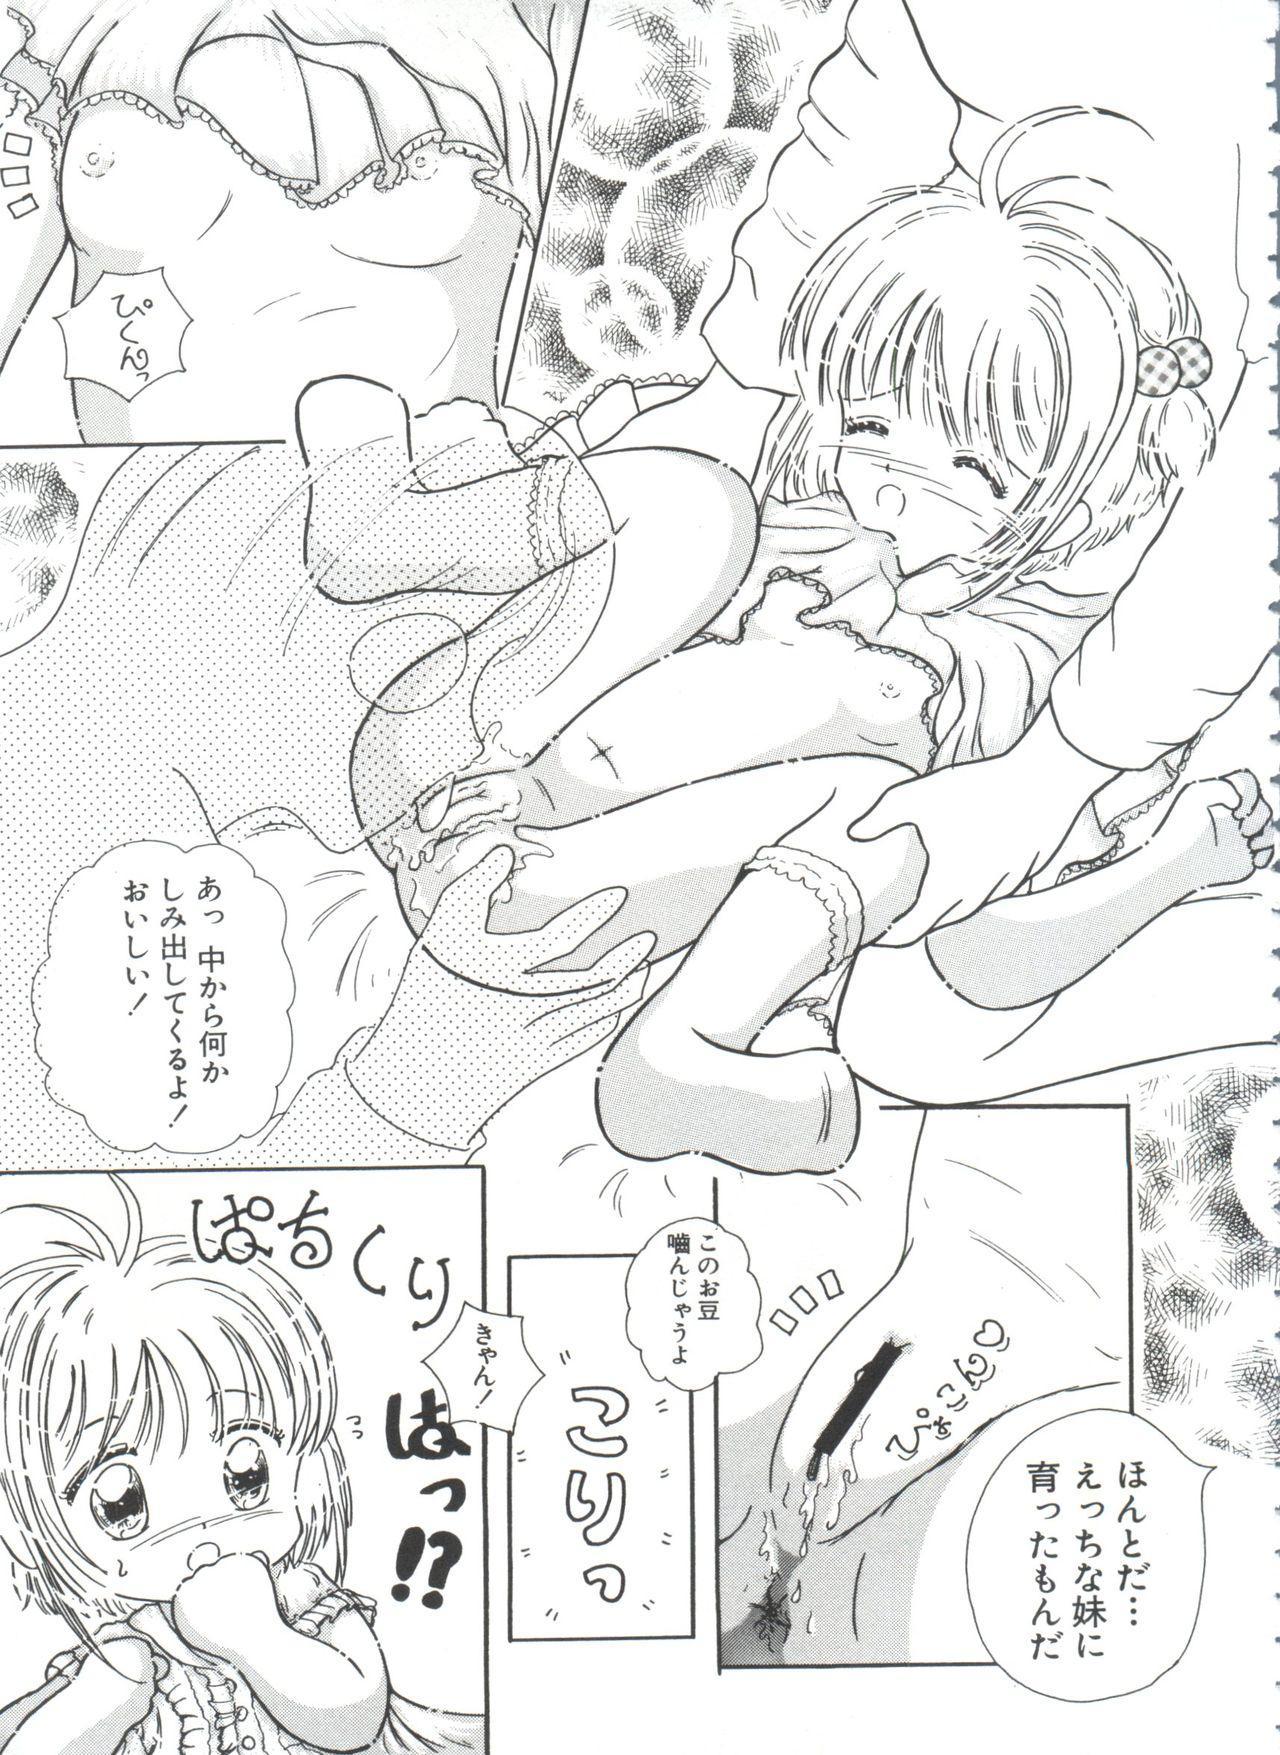 Ero-chan to Issho 3 62